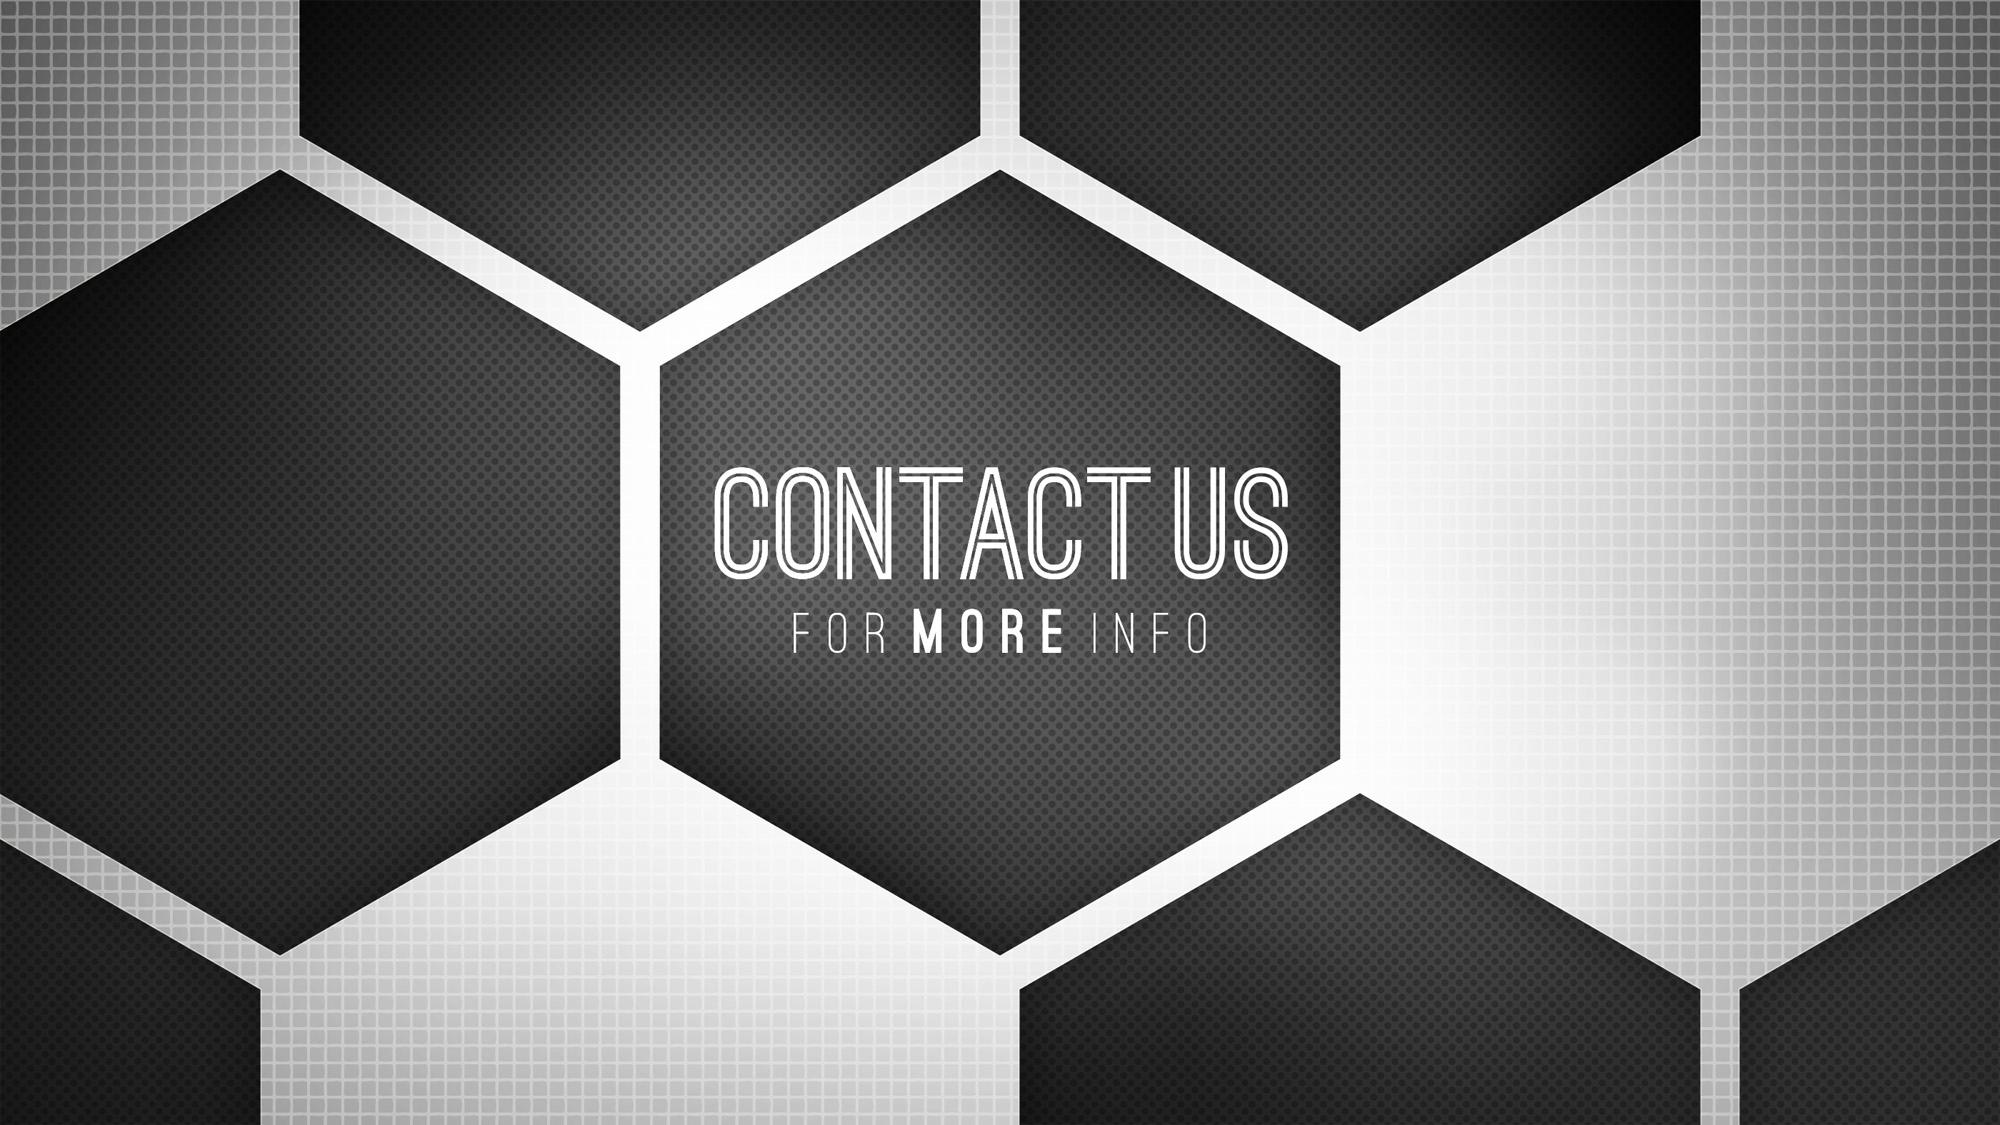 contact_us JRM.jpg